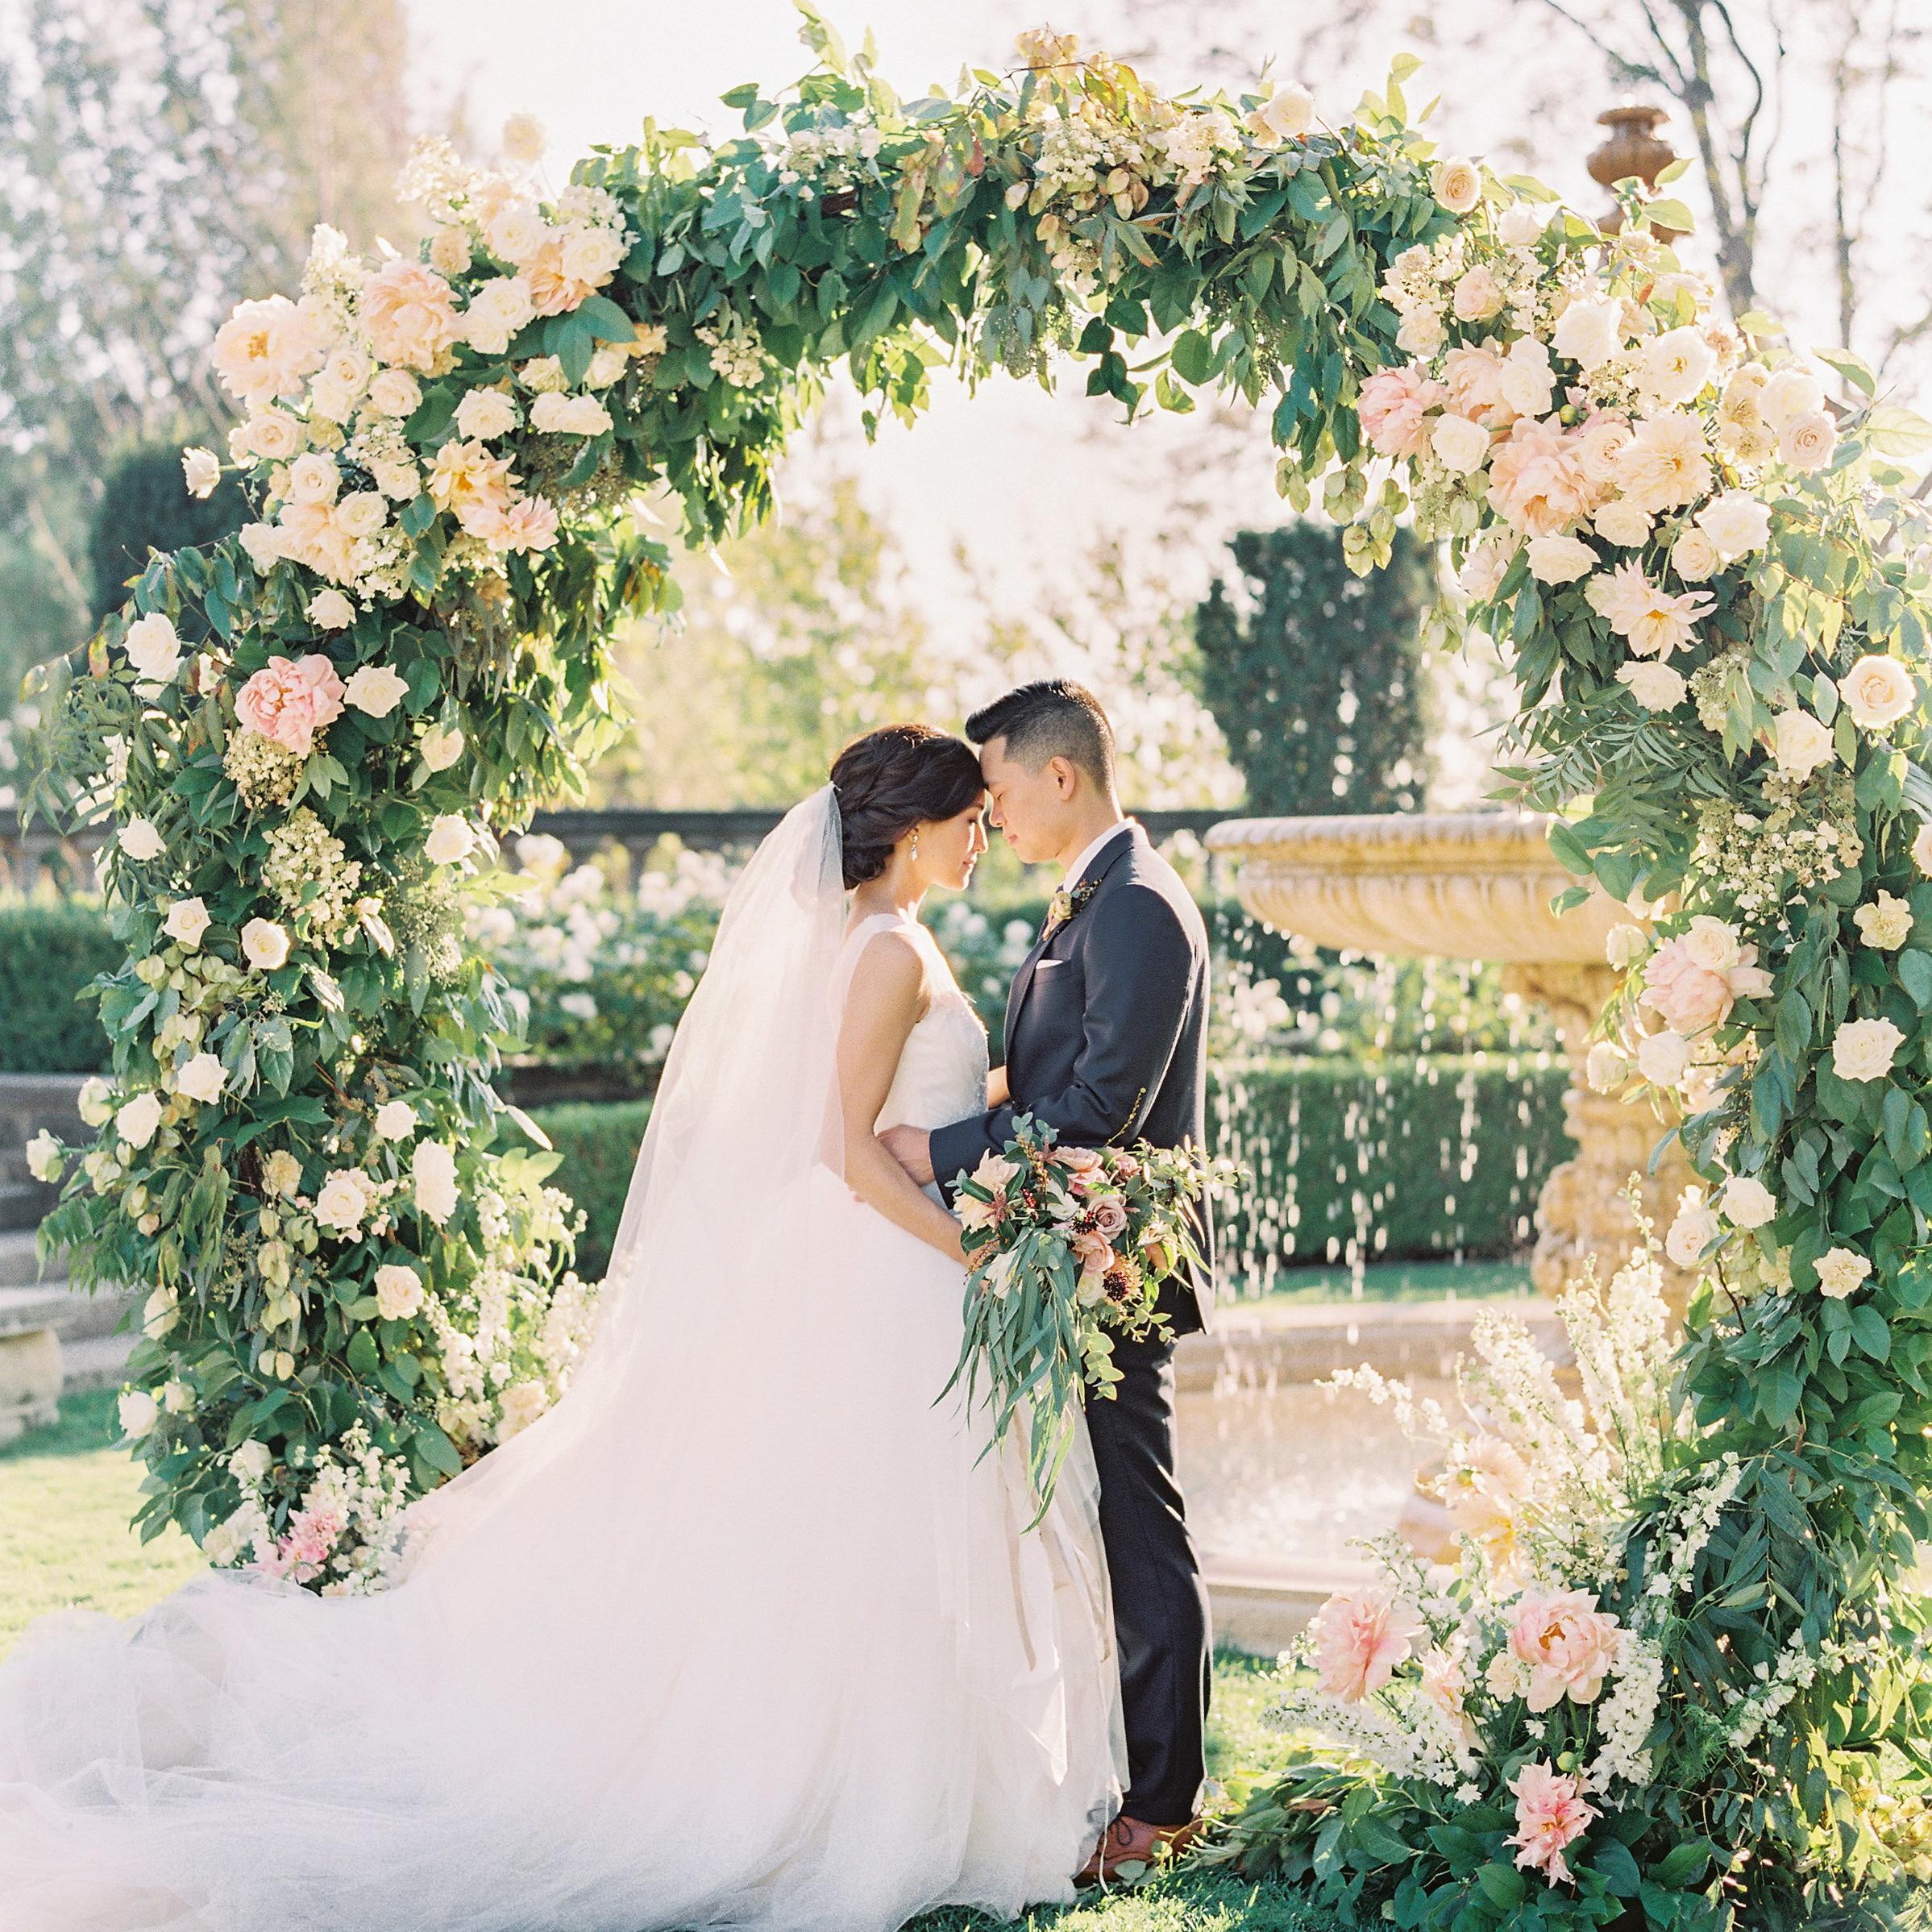 JEN & ALVIN  Beverly Hills, CA — Sally Pinera